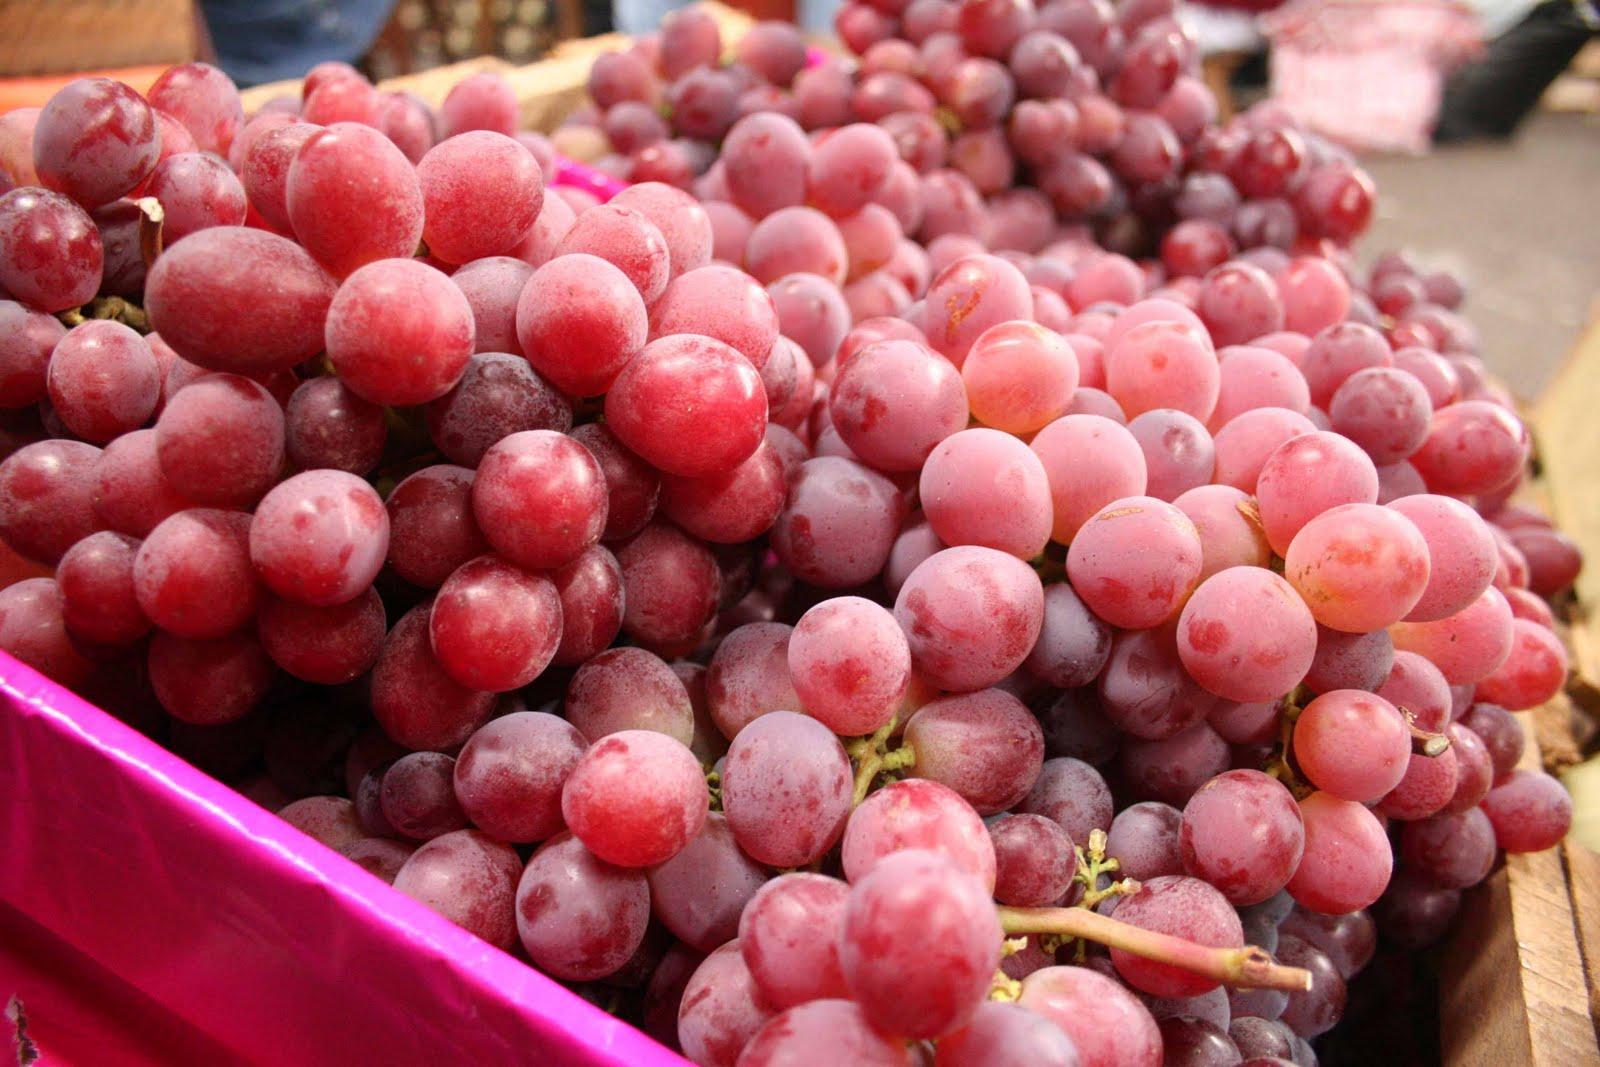 Productores de uva de mesa iniciaron cosecha 2017-2018